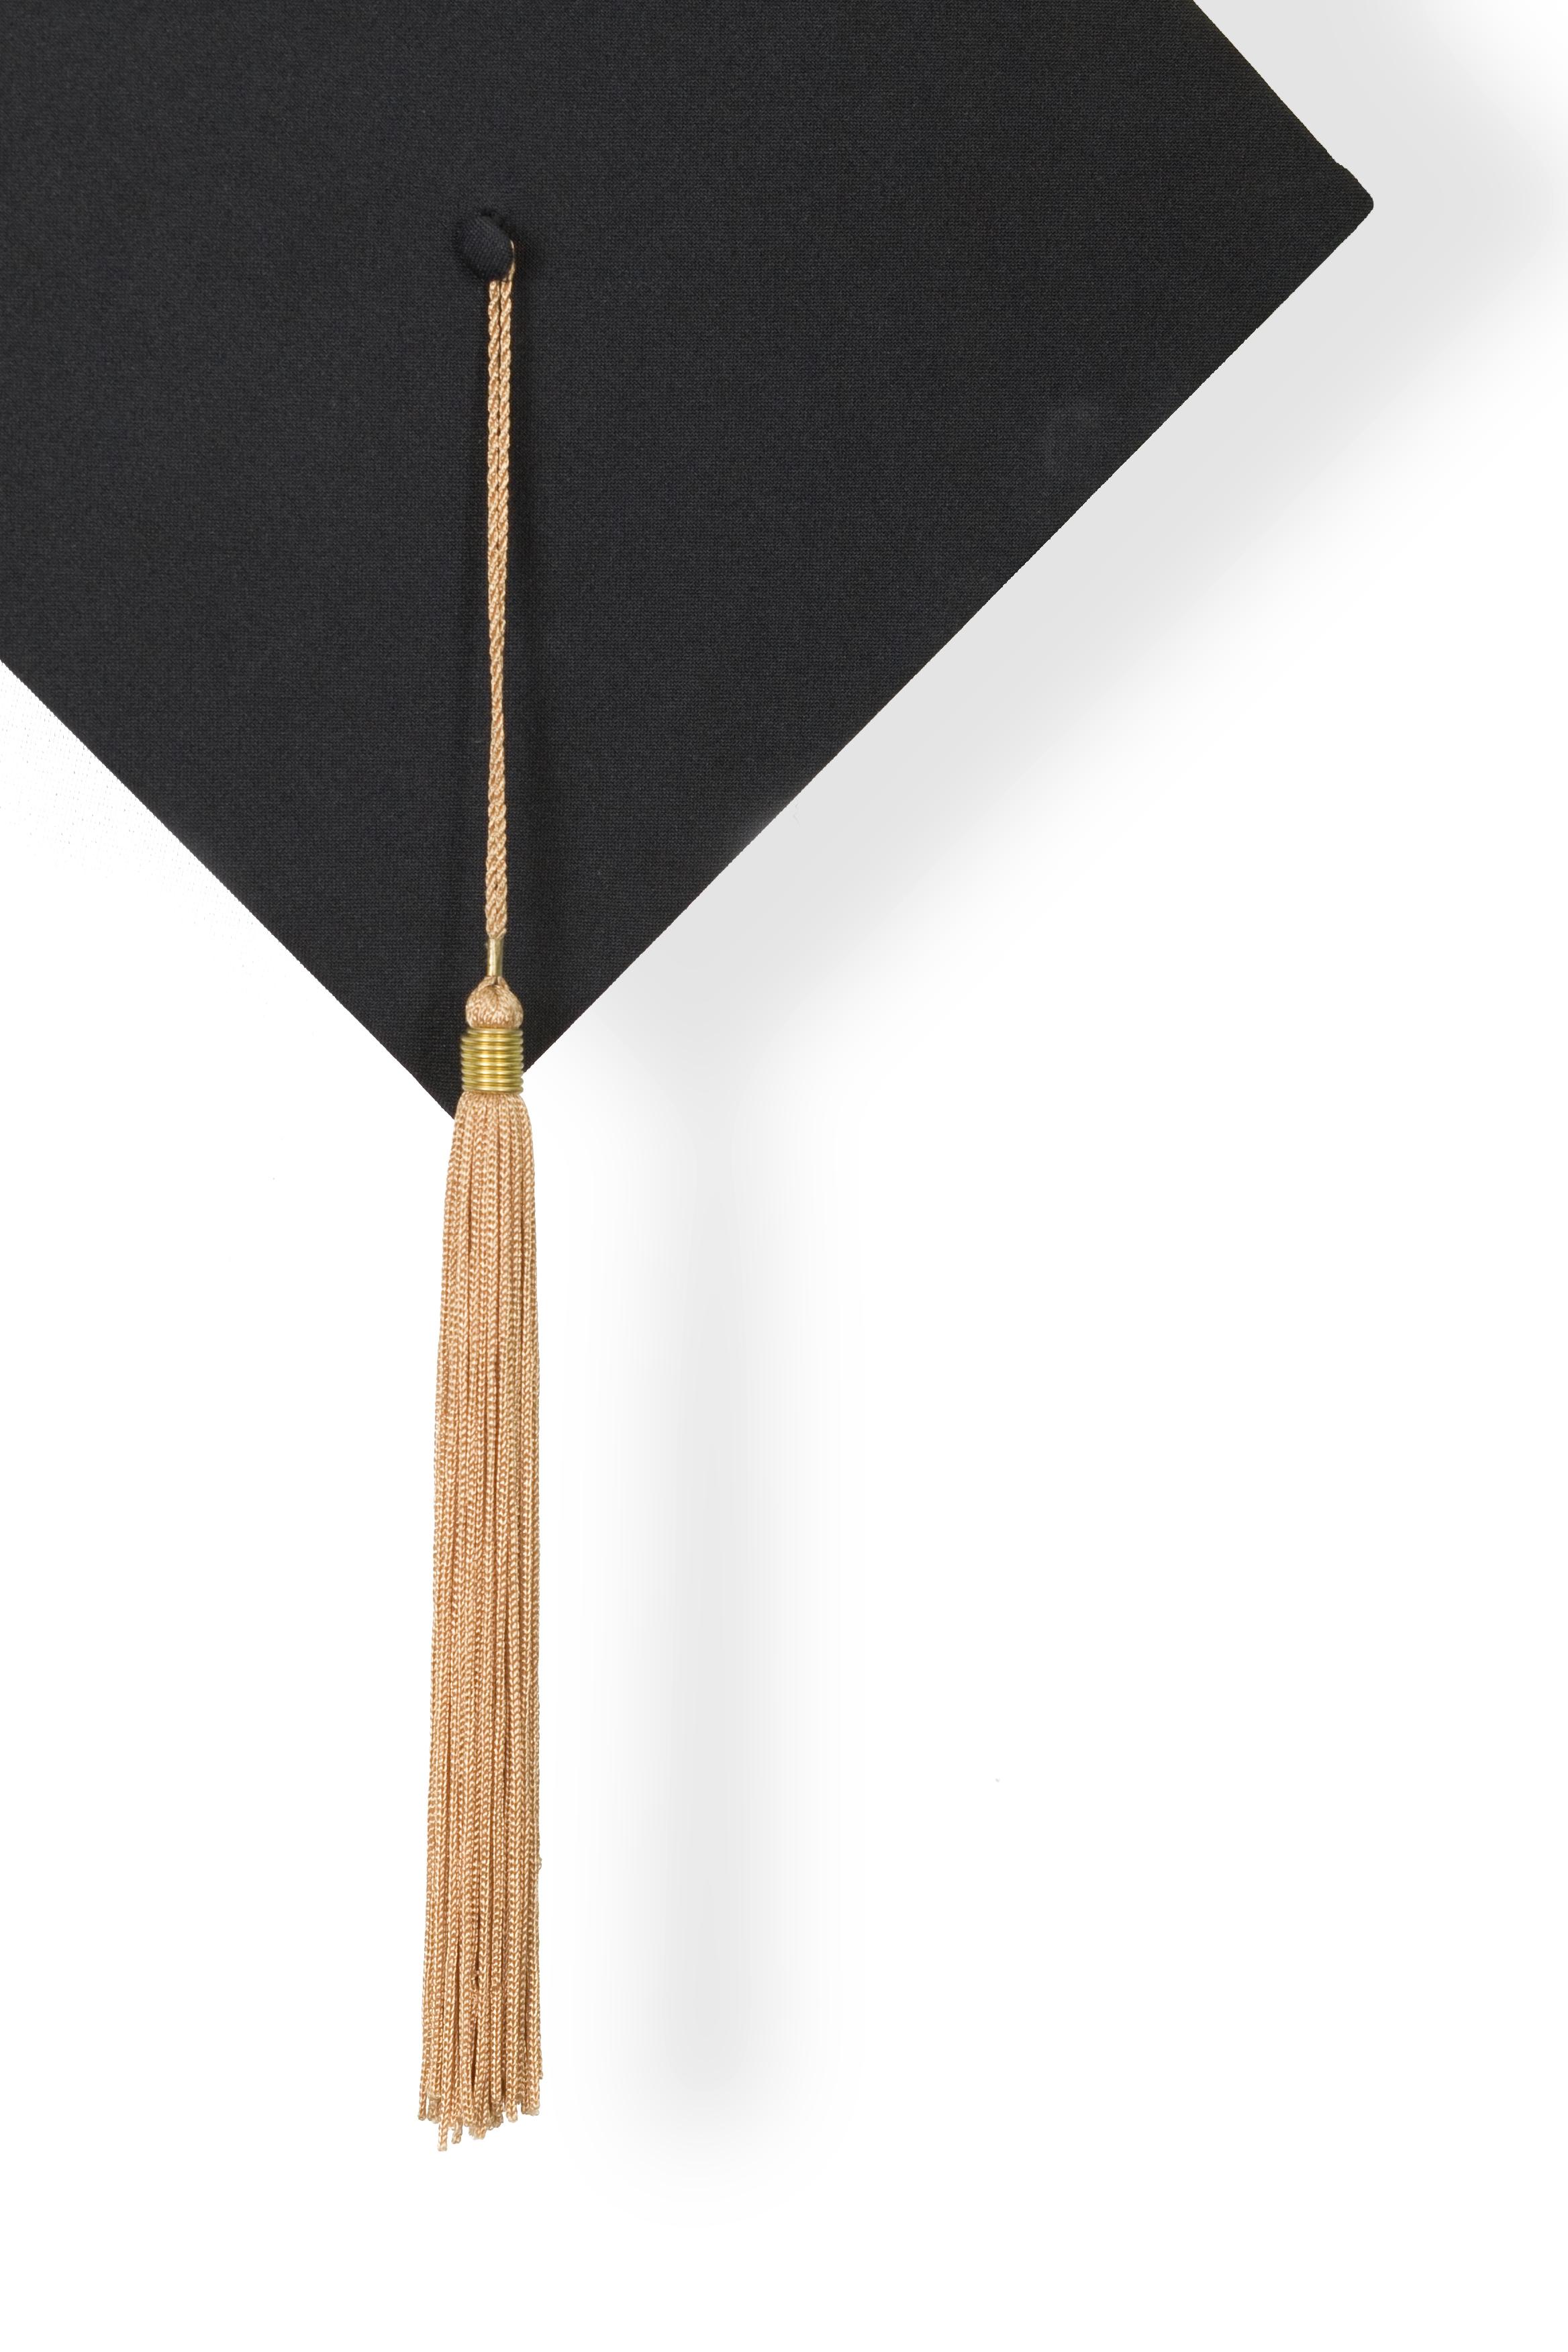 Free Graduation Cap And Tassel, Download Free Clip Art, Free Clip.